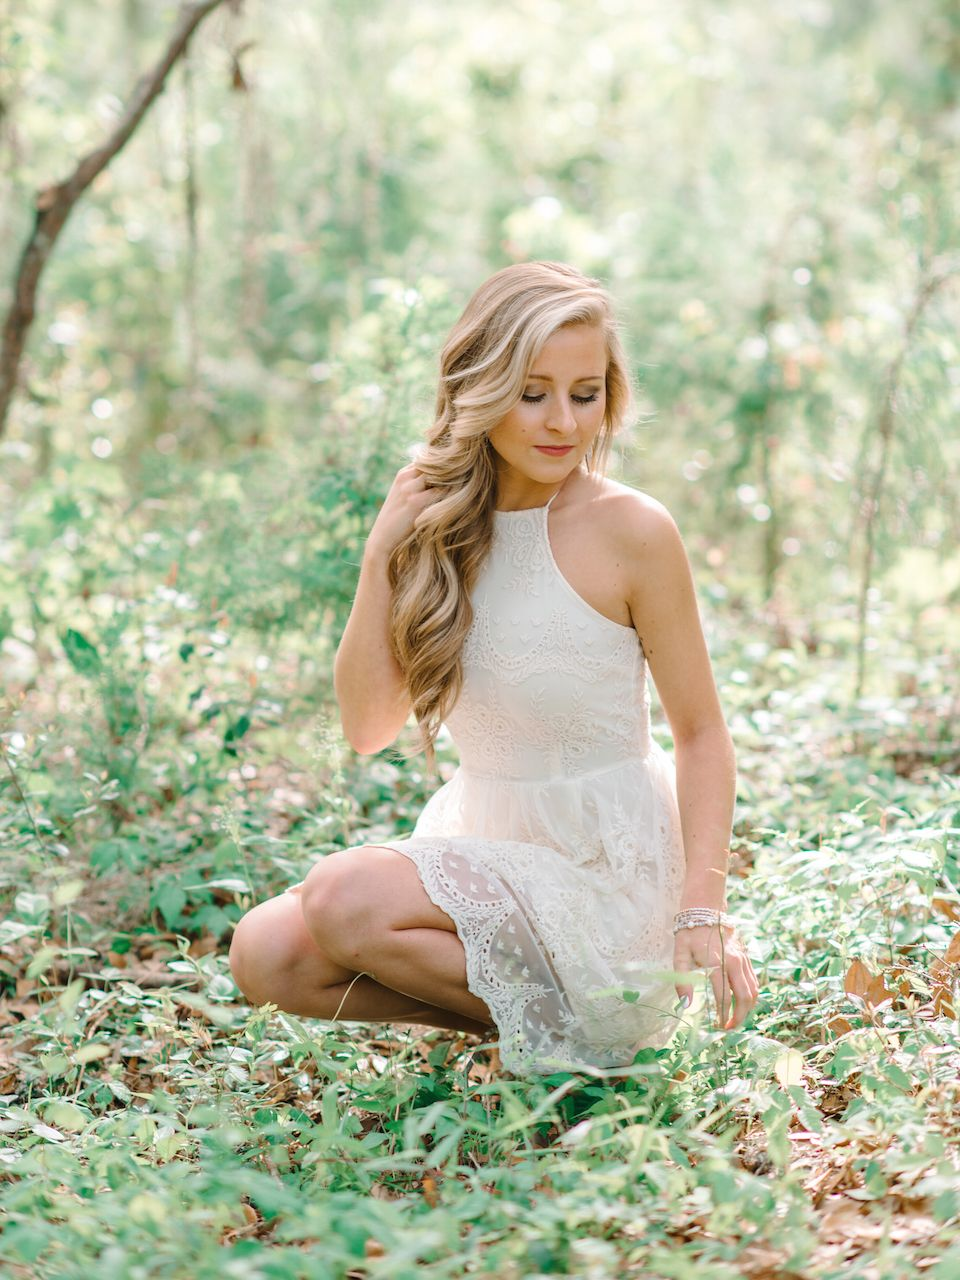 White Lace Short Dress Ideas For High School Senior